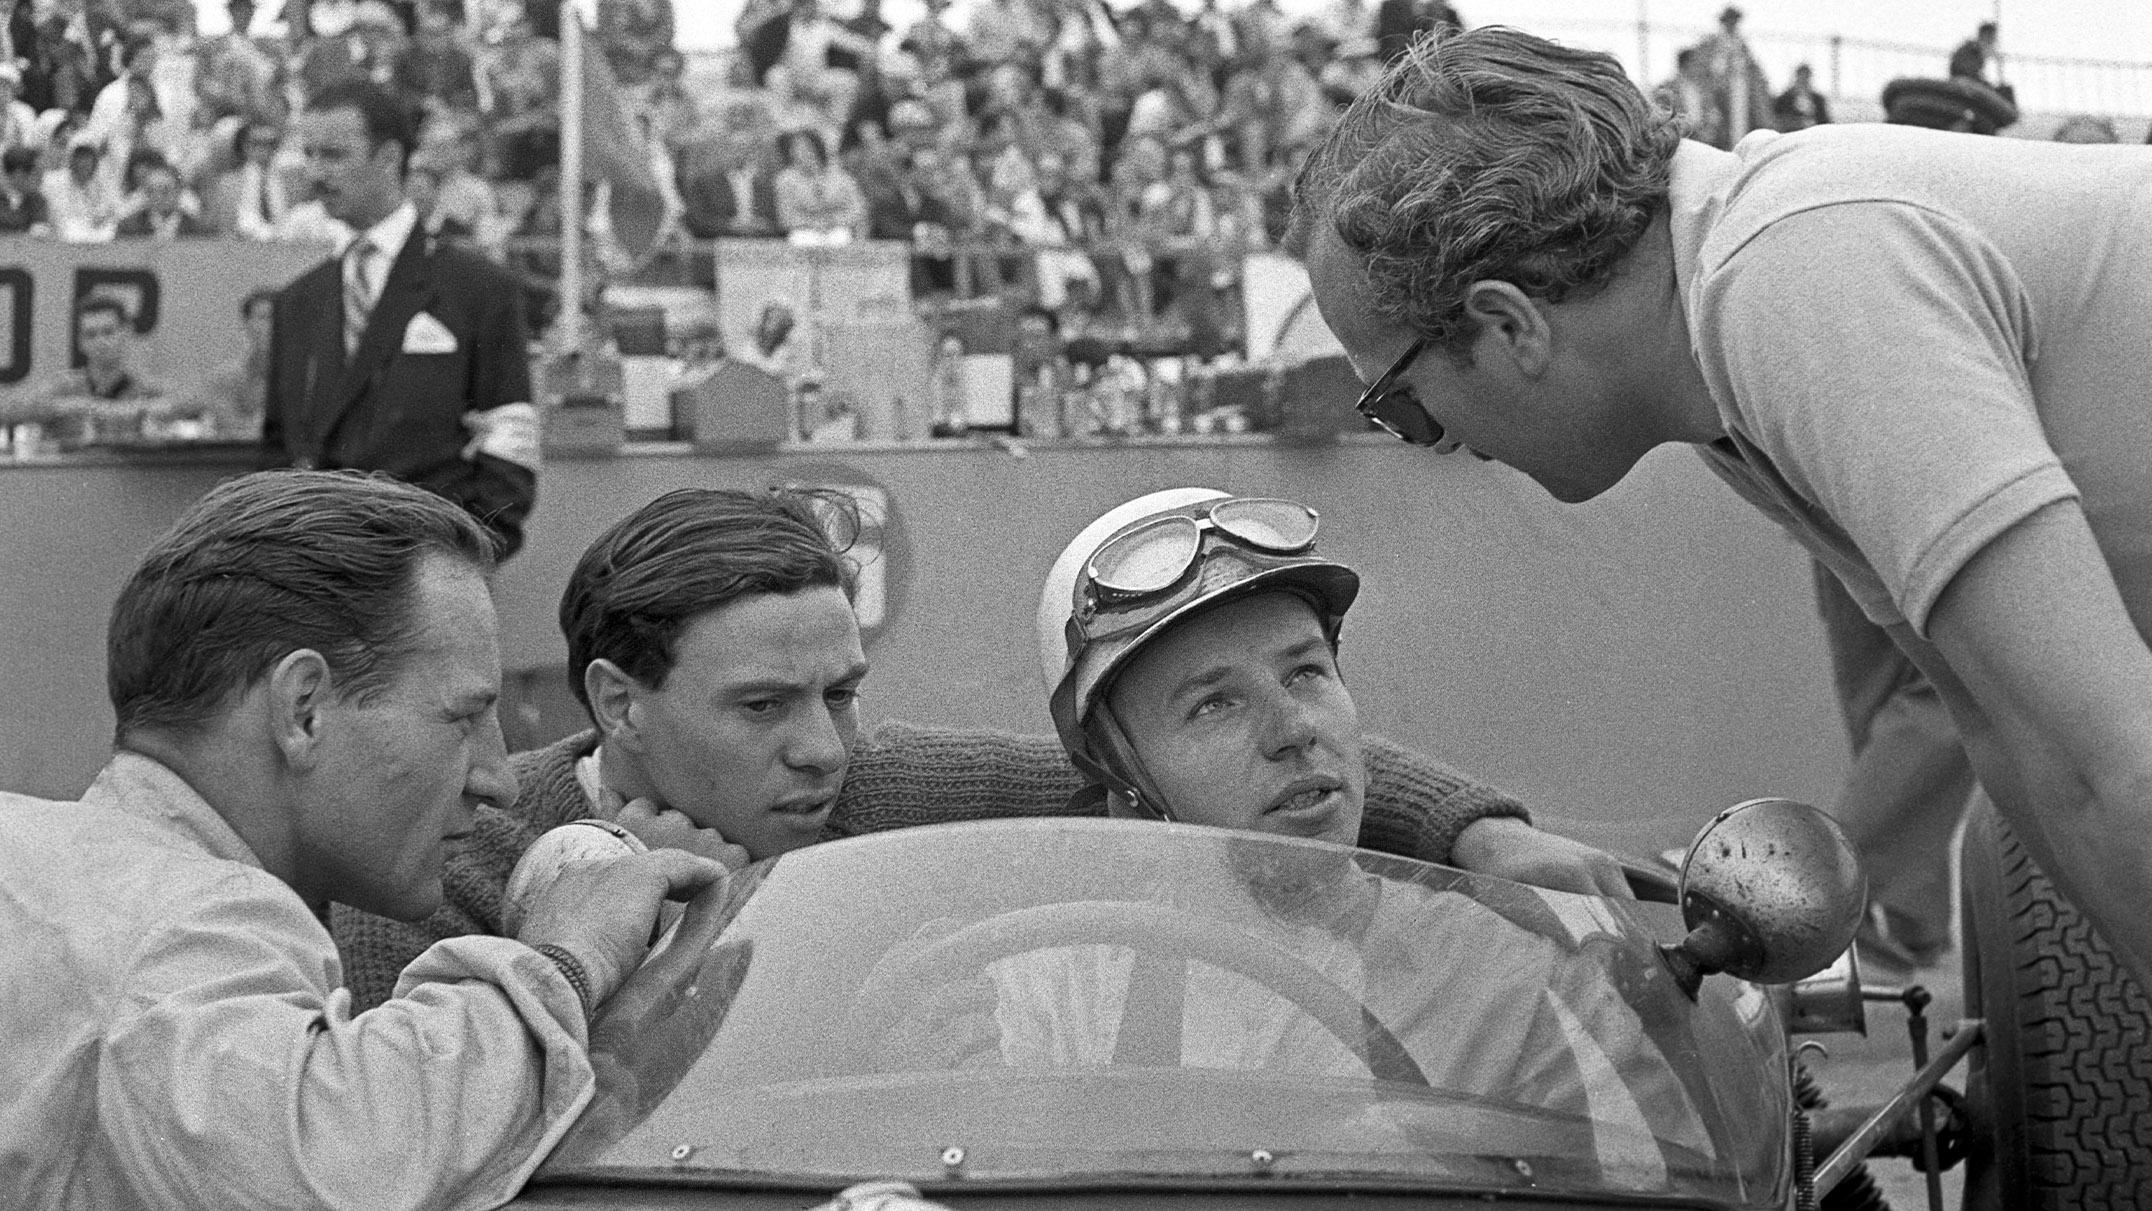 Innes Ireland Jim Clark John Surtees and Colin Chapman at the 1960 Portuguese Grand Prix